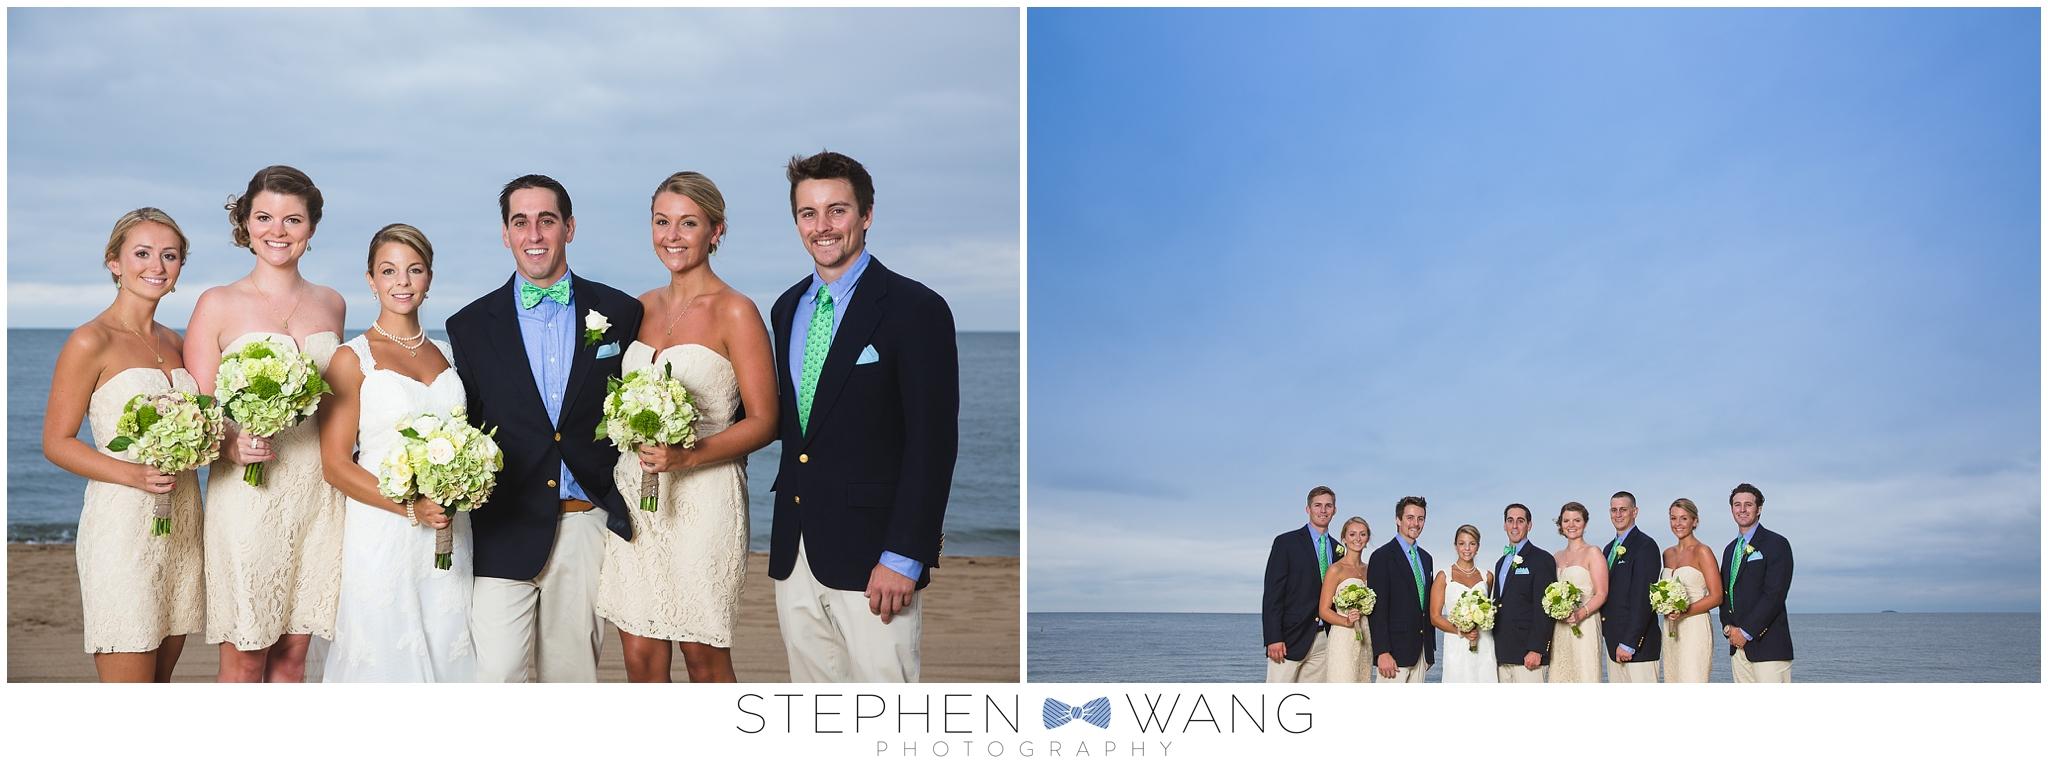 Stephen Wang Photography Madison Surf Club Wedding Photogrpahy CT Connecticut Shoreline Beach Summer Sunset -08-12_0016.jpg